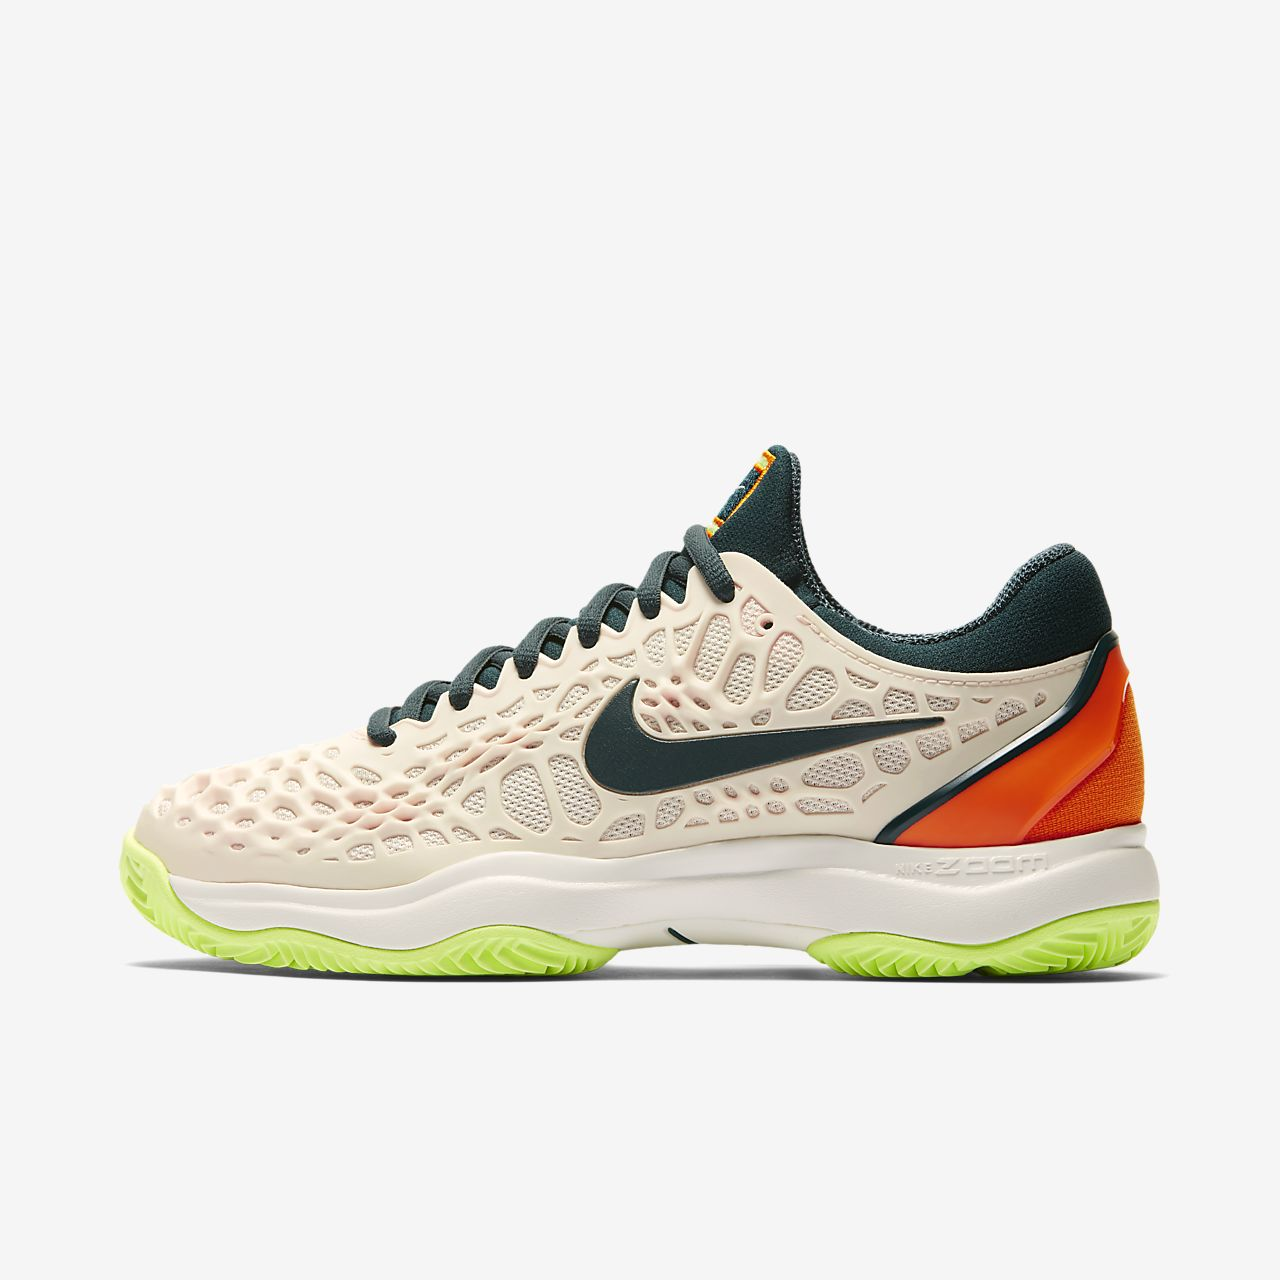 fdb310e0f0ff Nike Zoom Cage 3 Clay Women s Tennis Shoe. Nike.com IE